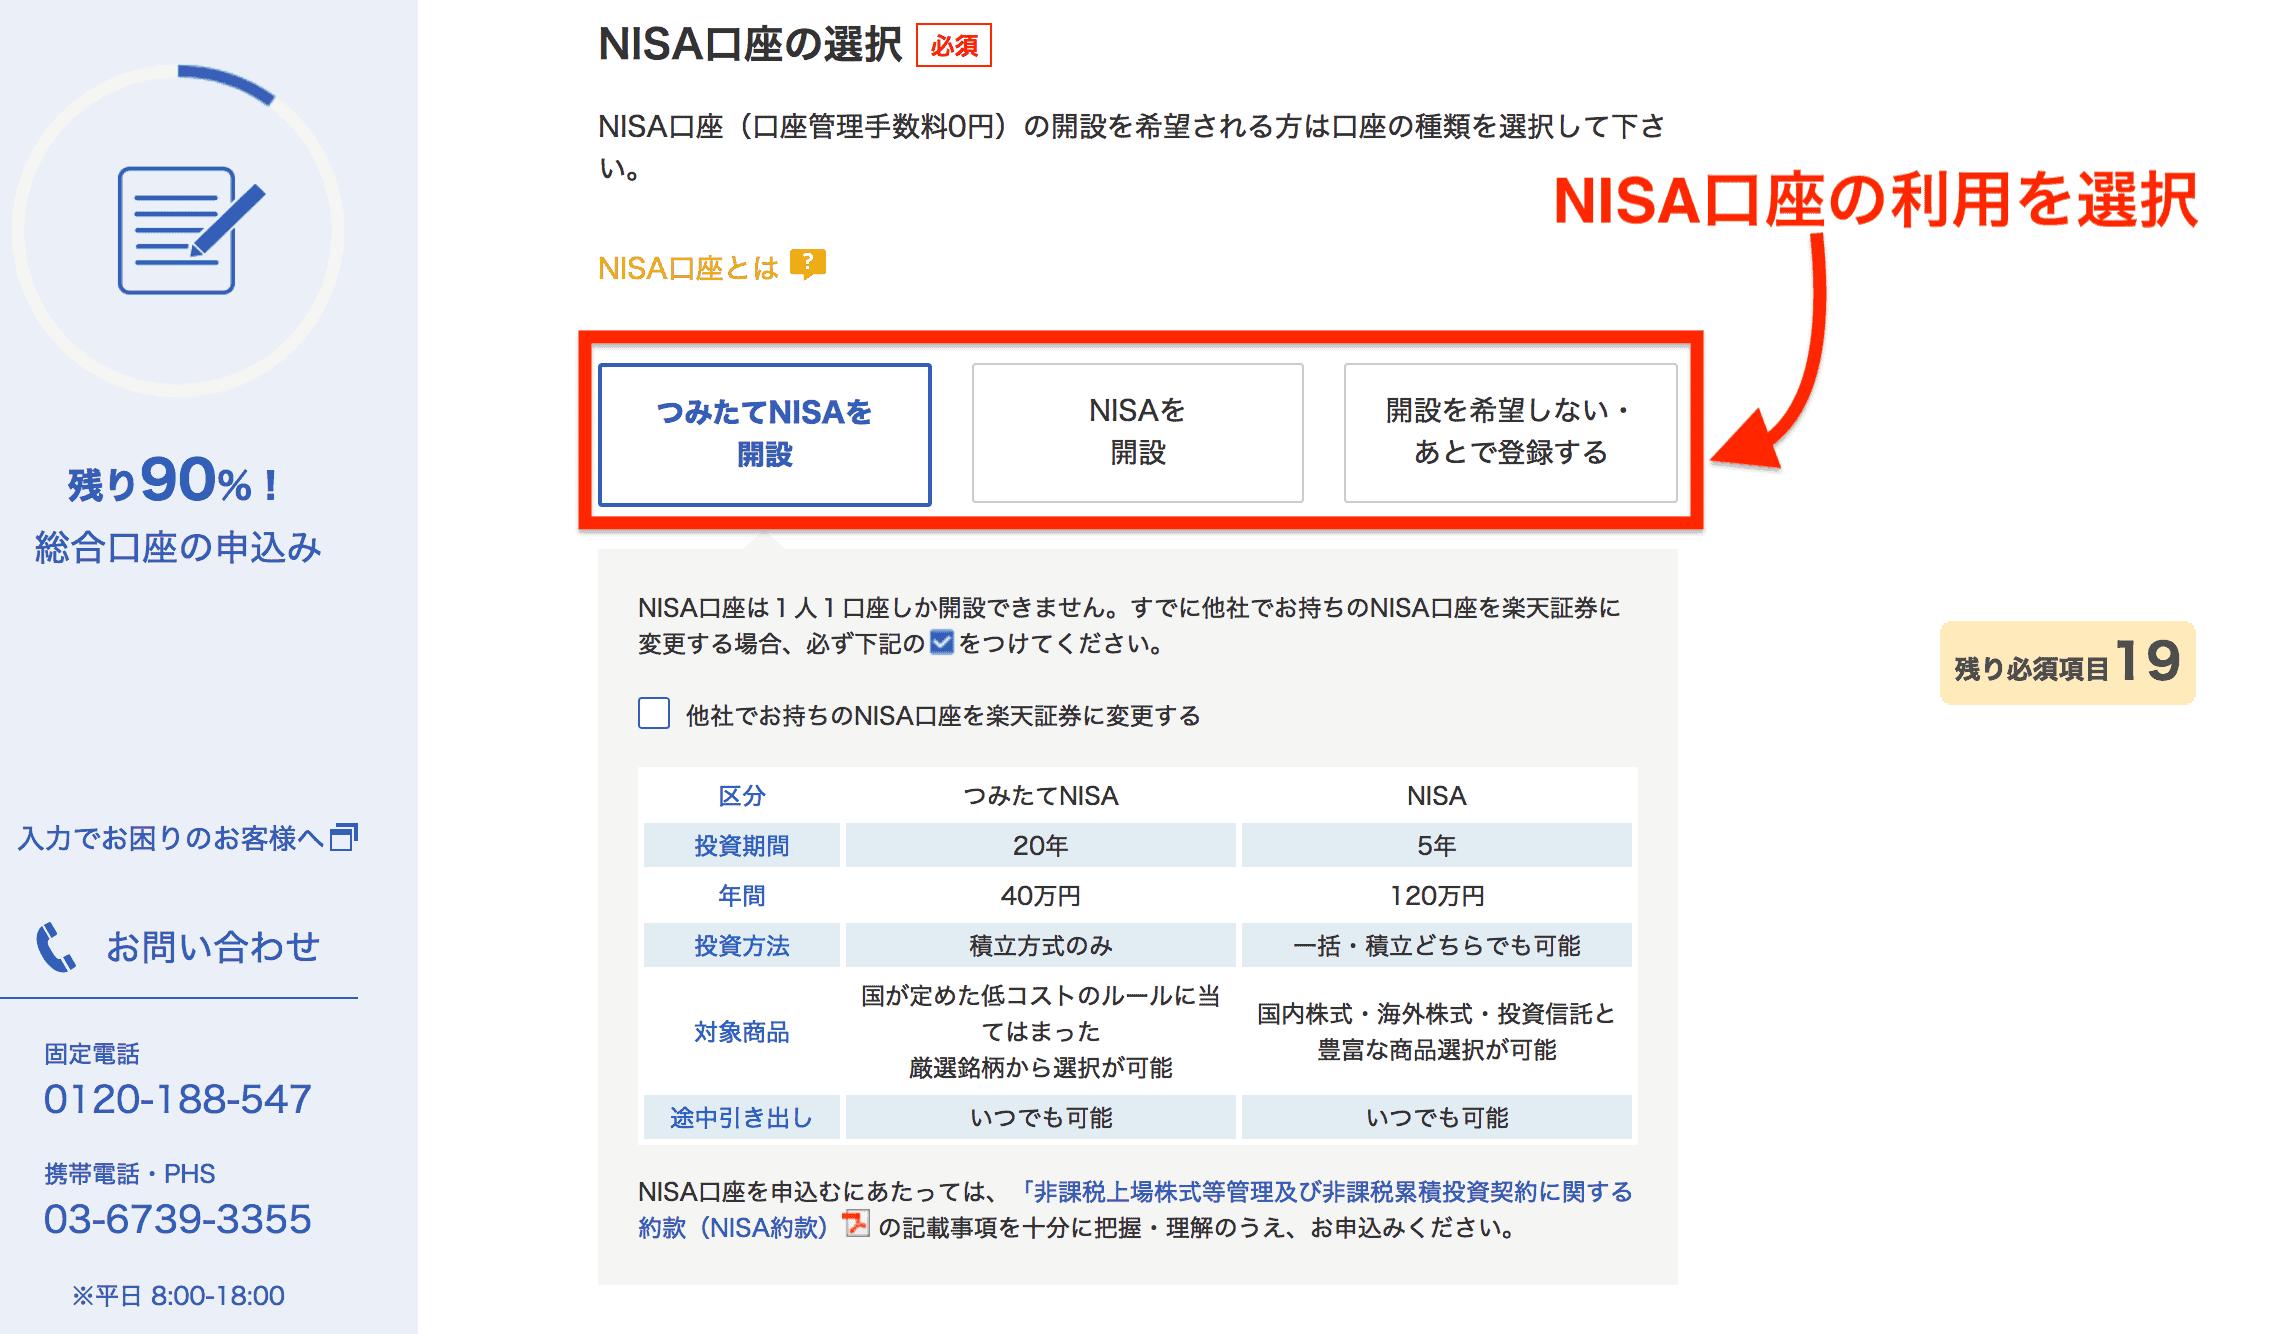 NISAの選択画面|NISA・つみたてNISA・保留から選ぶ